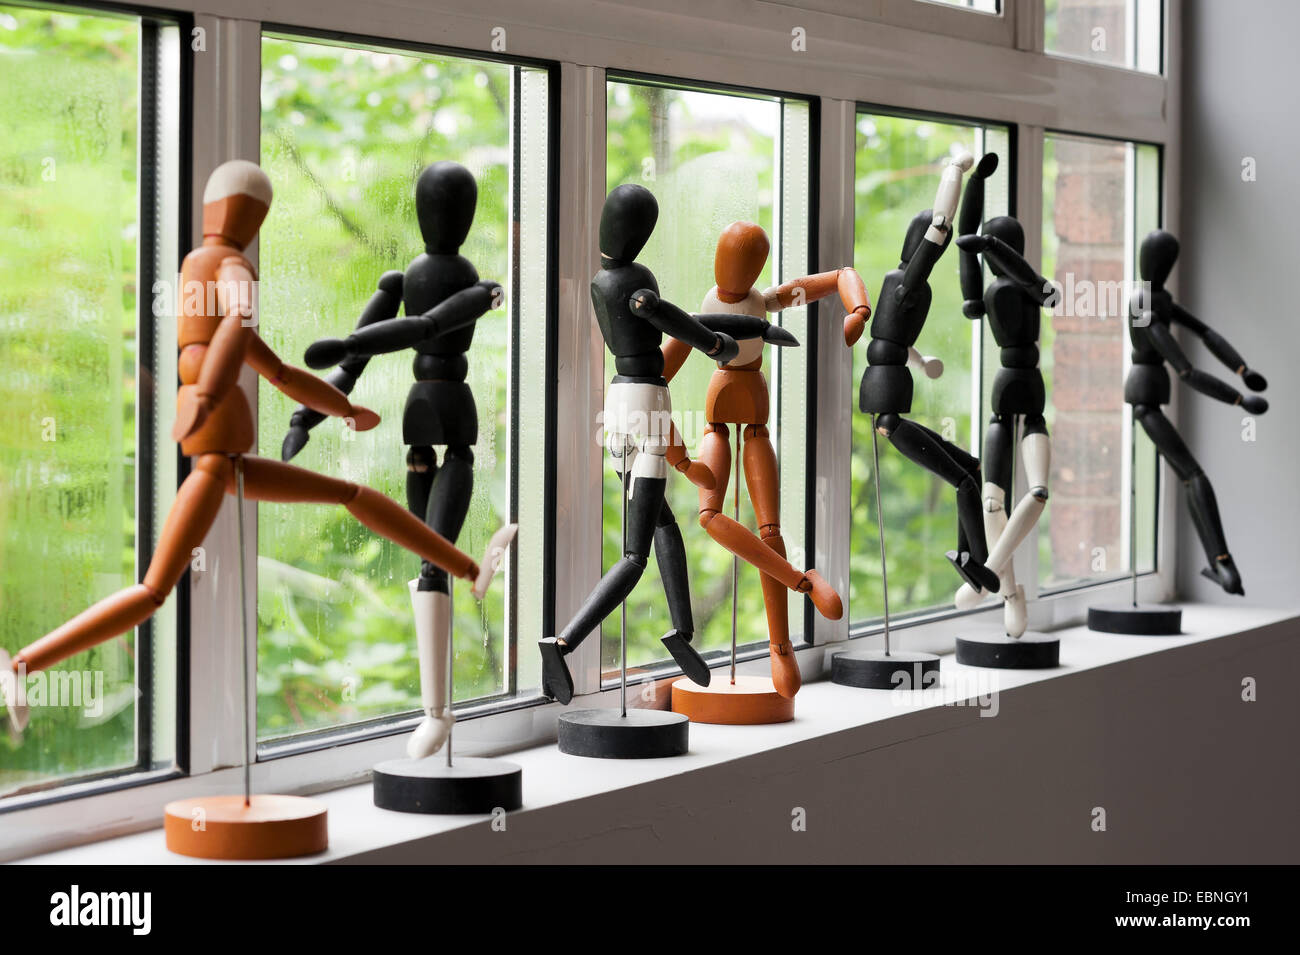 Row of artist mannequins along windowsill. - Stock Image